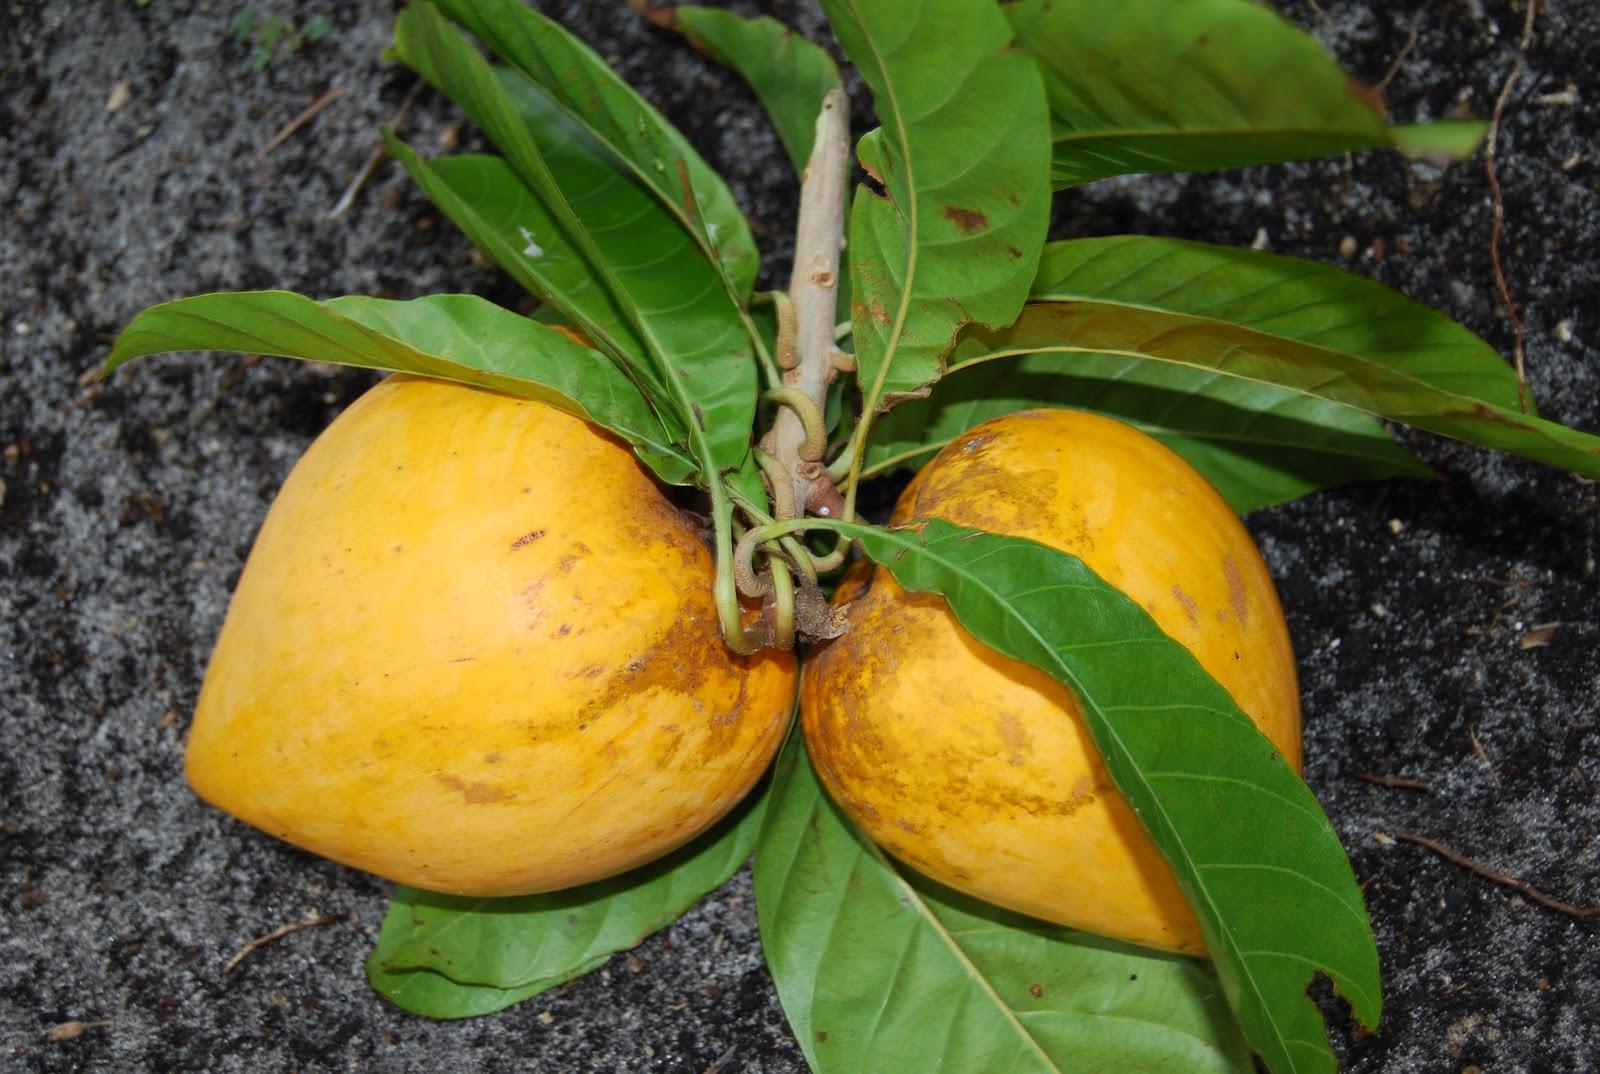 Helen A Lockey Its Egg Fruit Season In South Florida